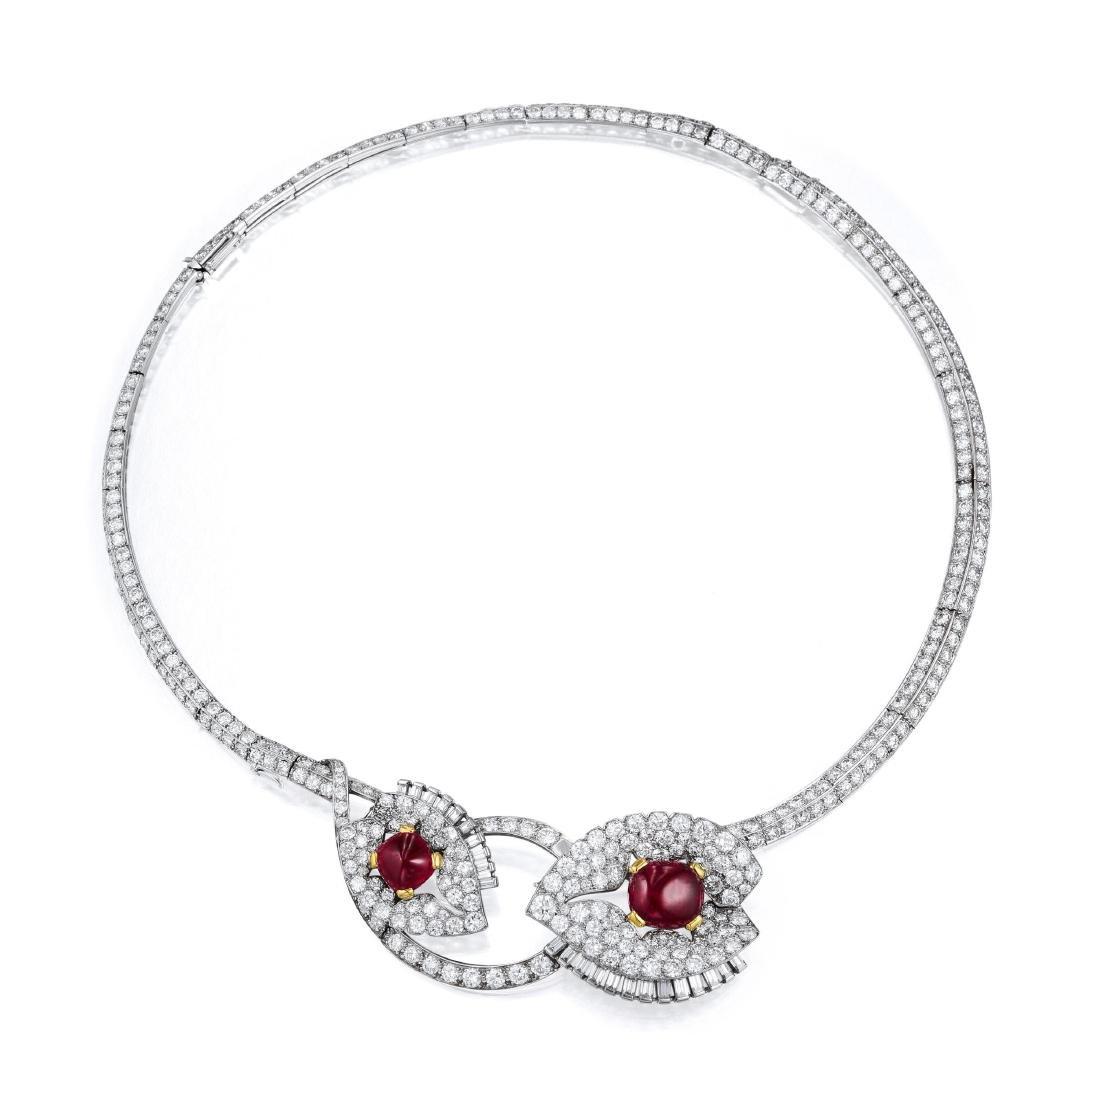 Cartier Art Deco Convertible Burmese Ruby and Diamond